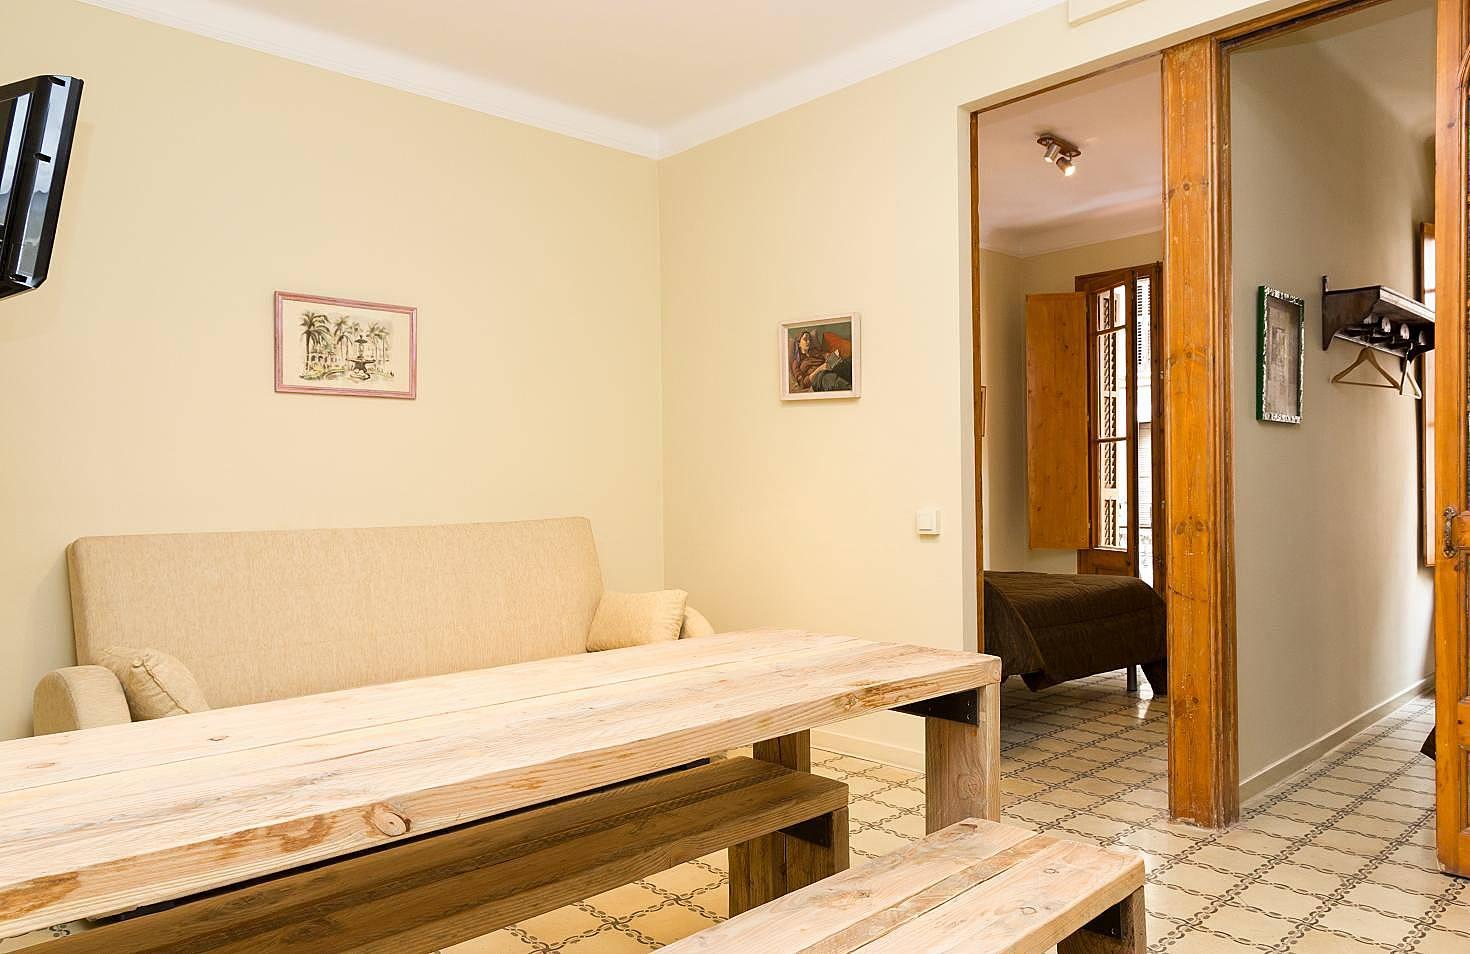 Gracia 3 dormitorios en barcelona centro barcelona for Habitacion 73 barcelona